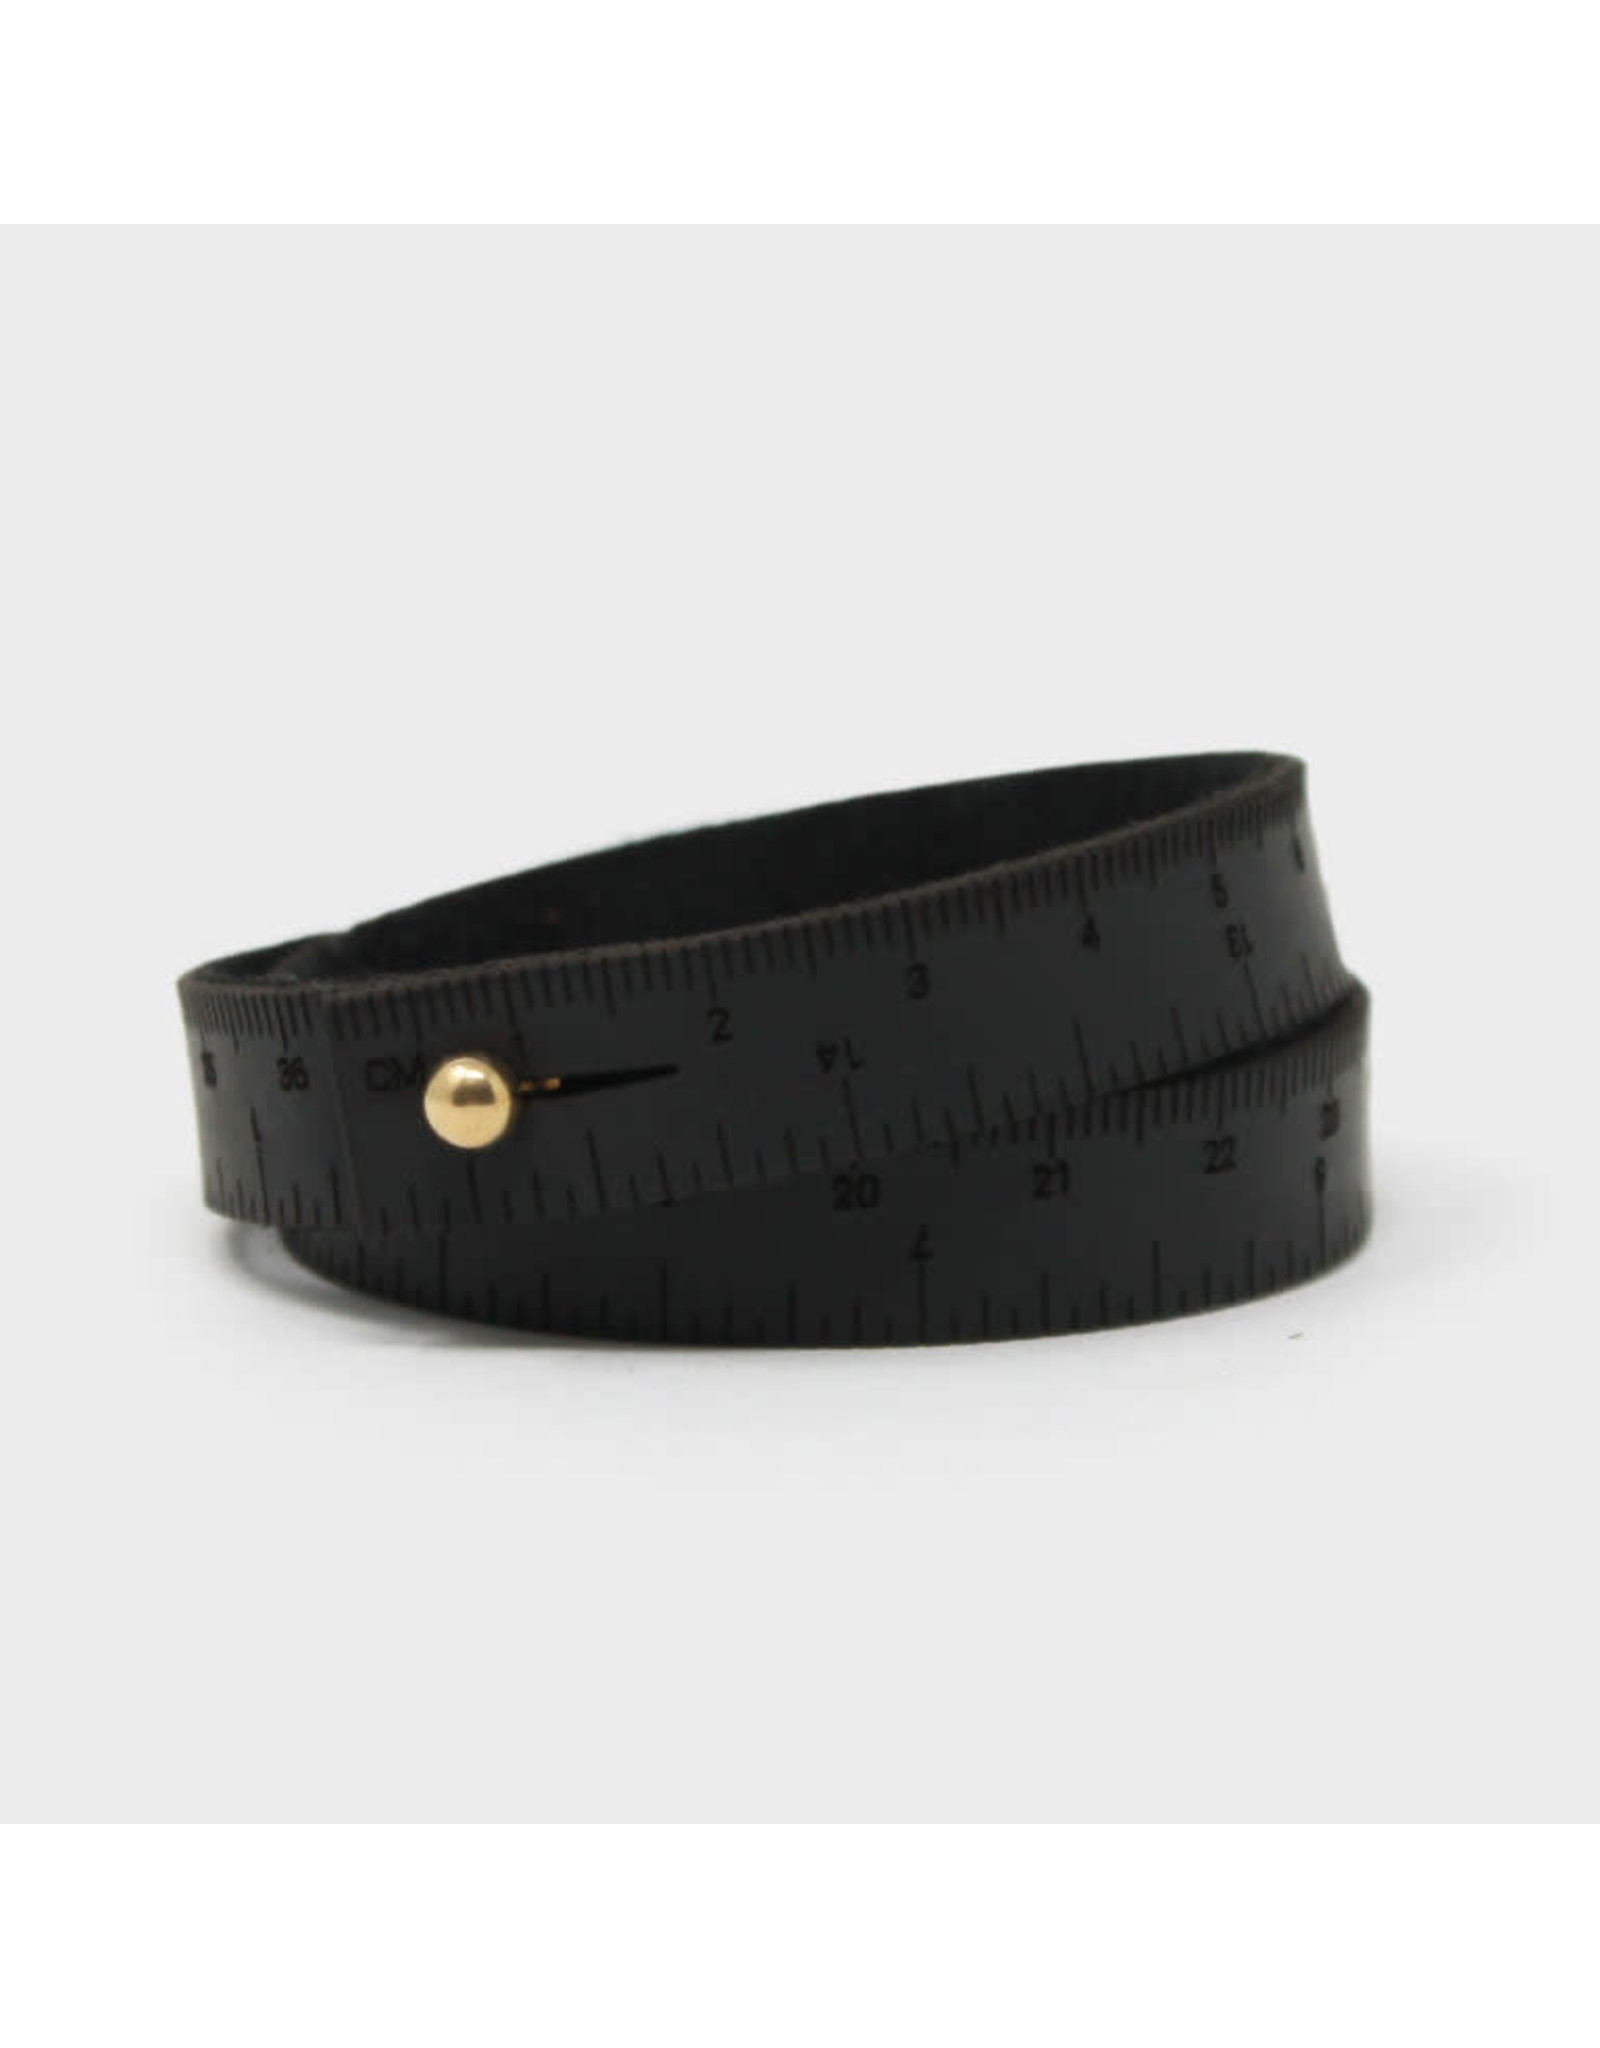 Wrist Ruler - BLACK - 17 inches